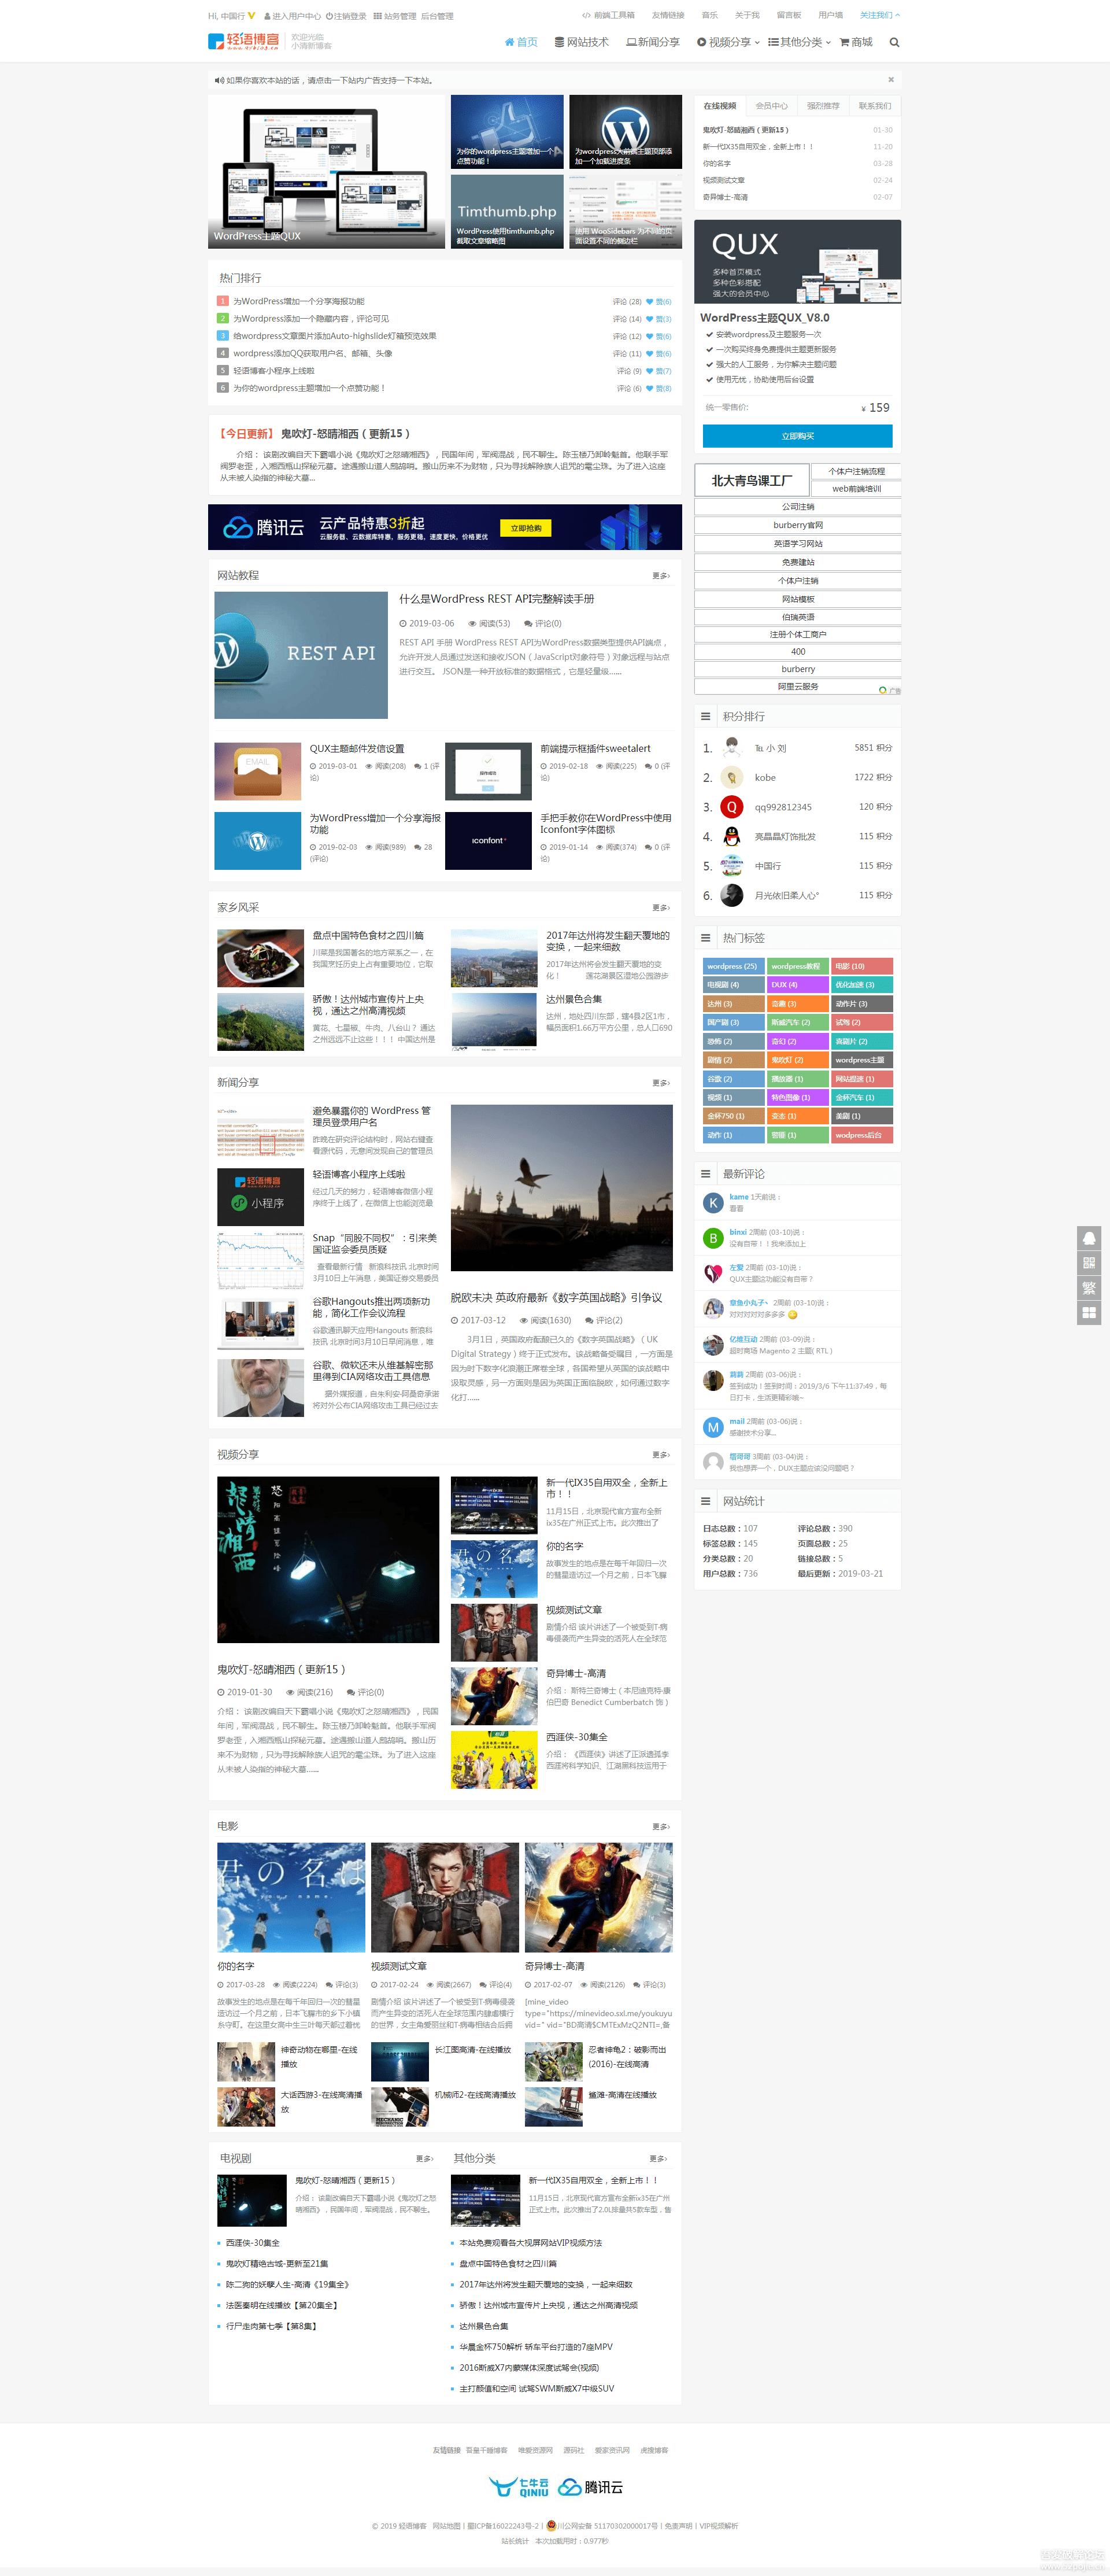 WordPress博客QUX主题V9.1.5版分享-独白教程网